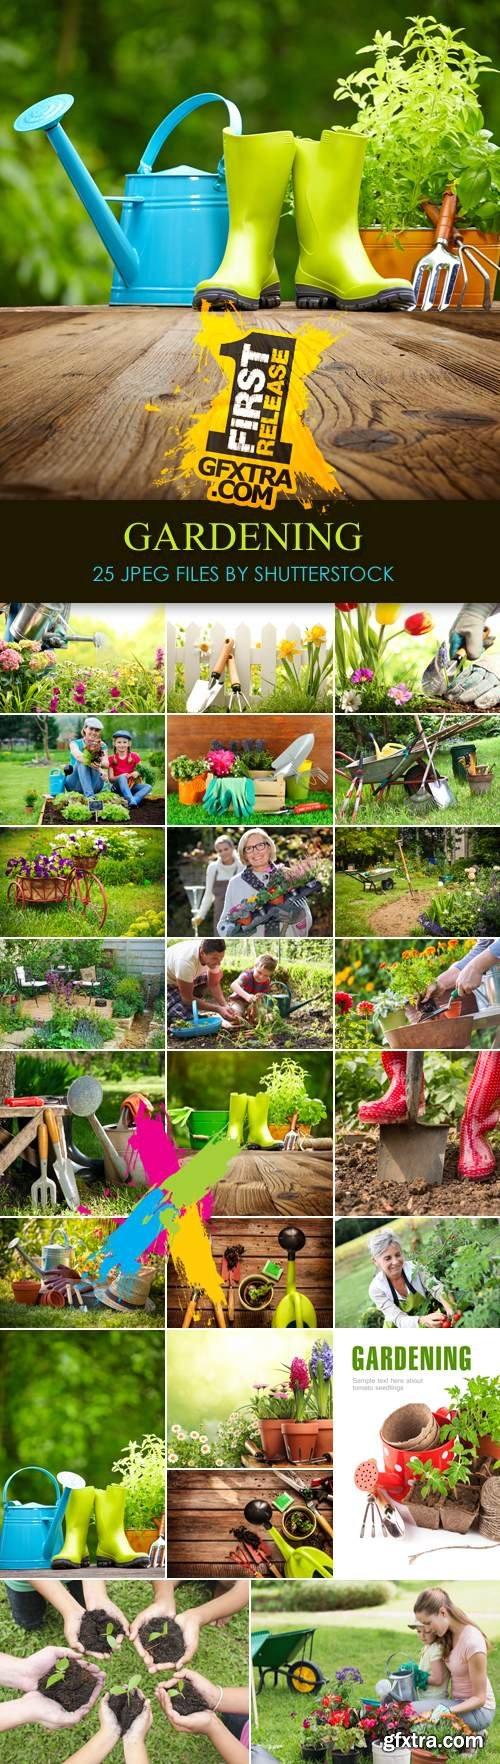 Stock Photo - Spring 2014 Gardening